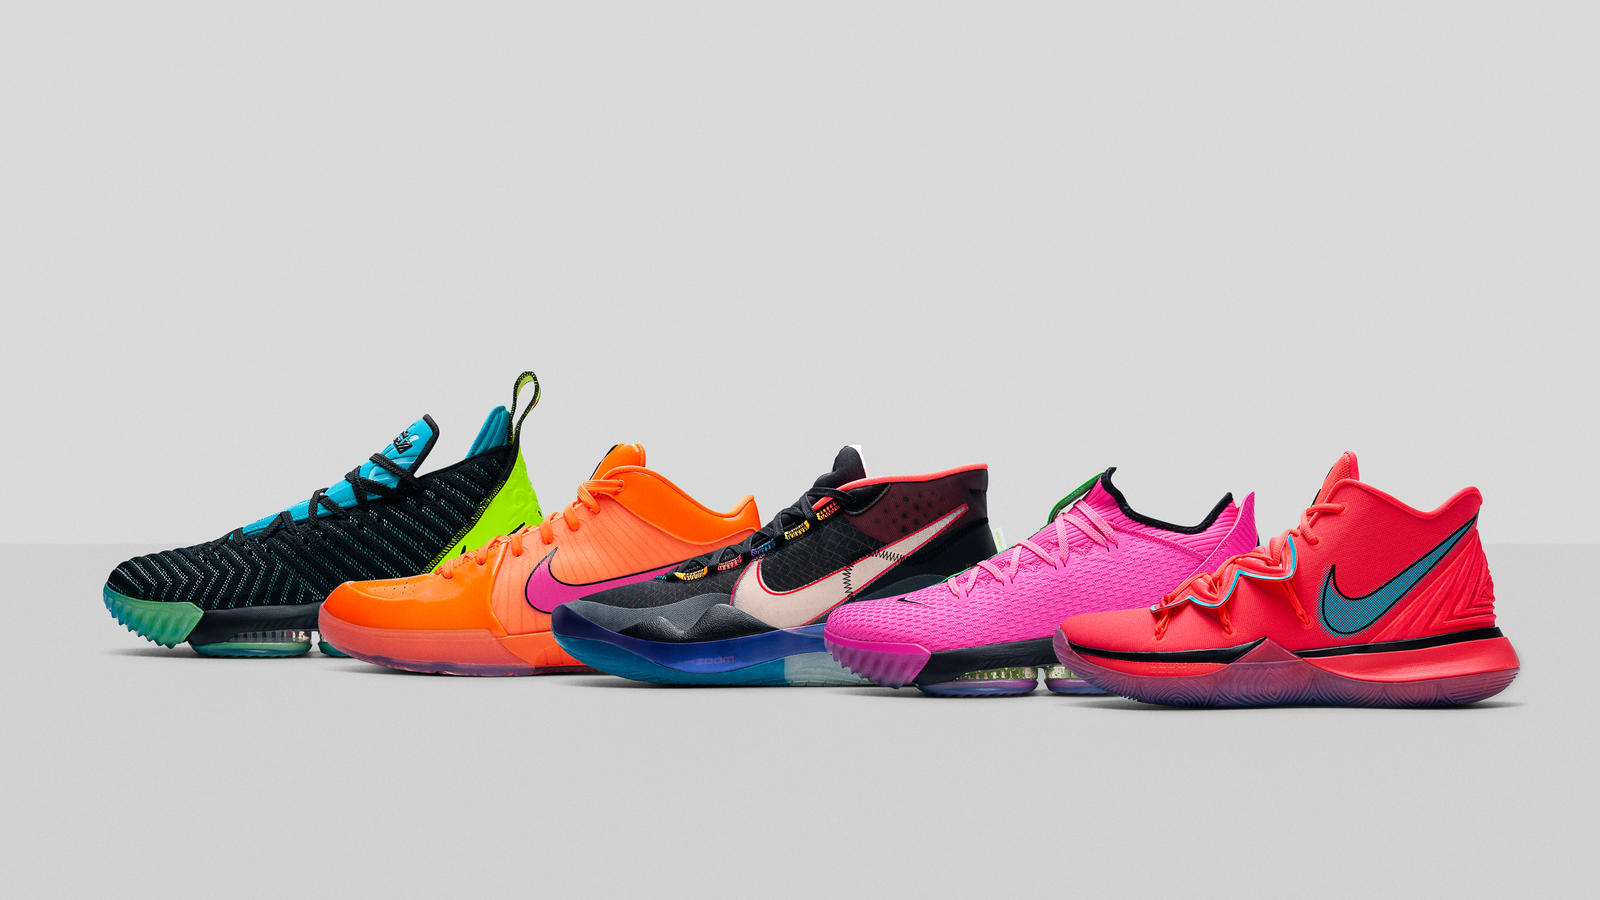 2019 WNBA All-Star Game PE Collection